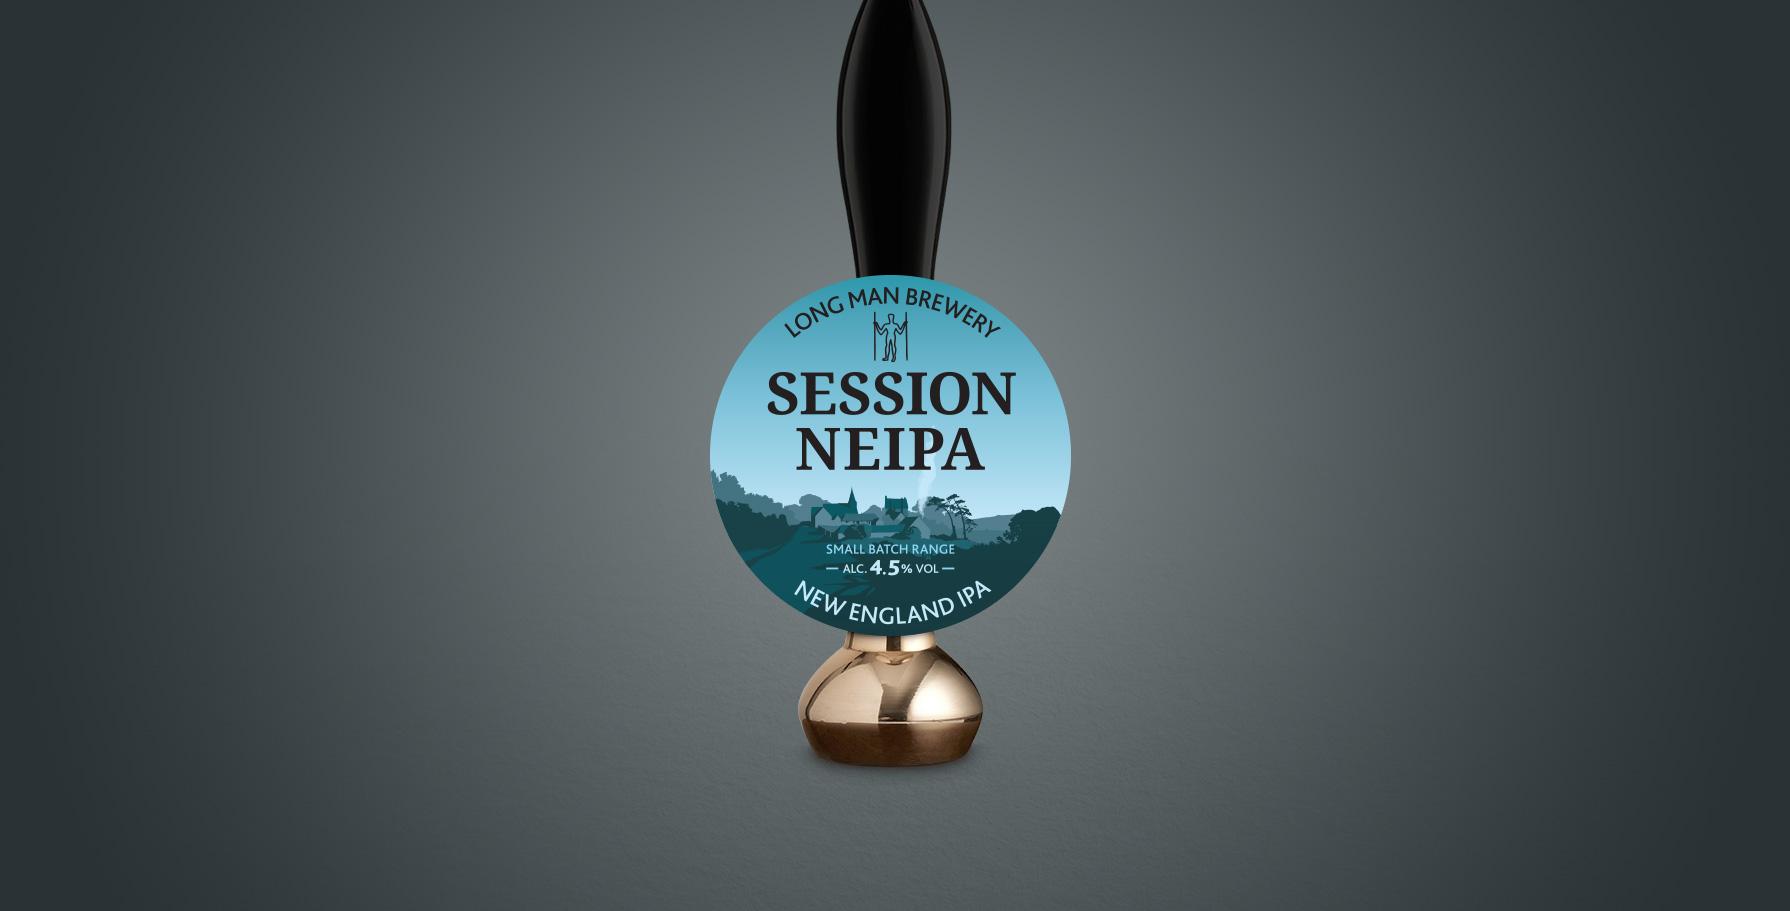 Session NEIPA